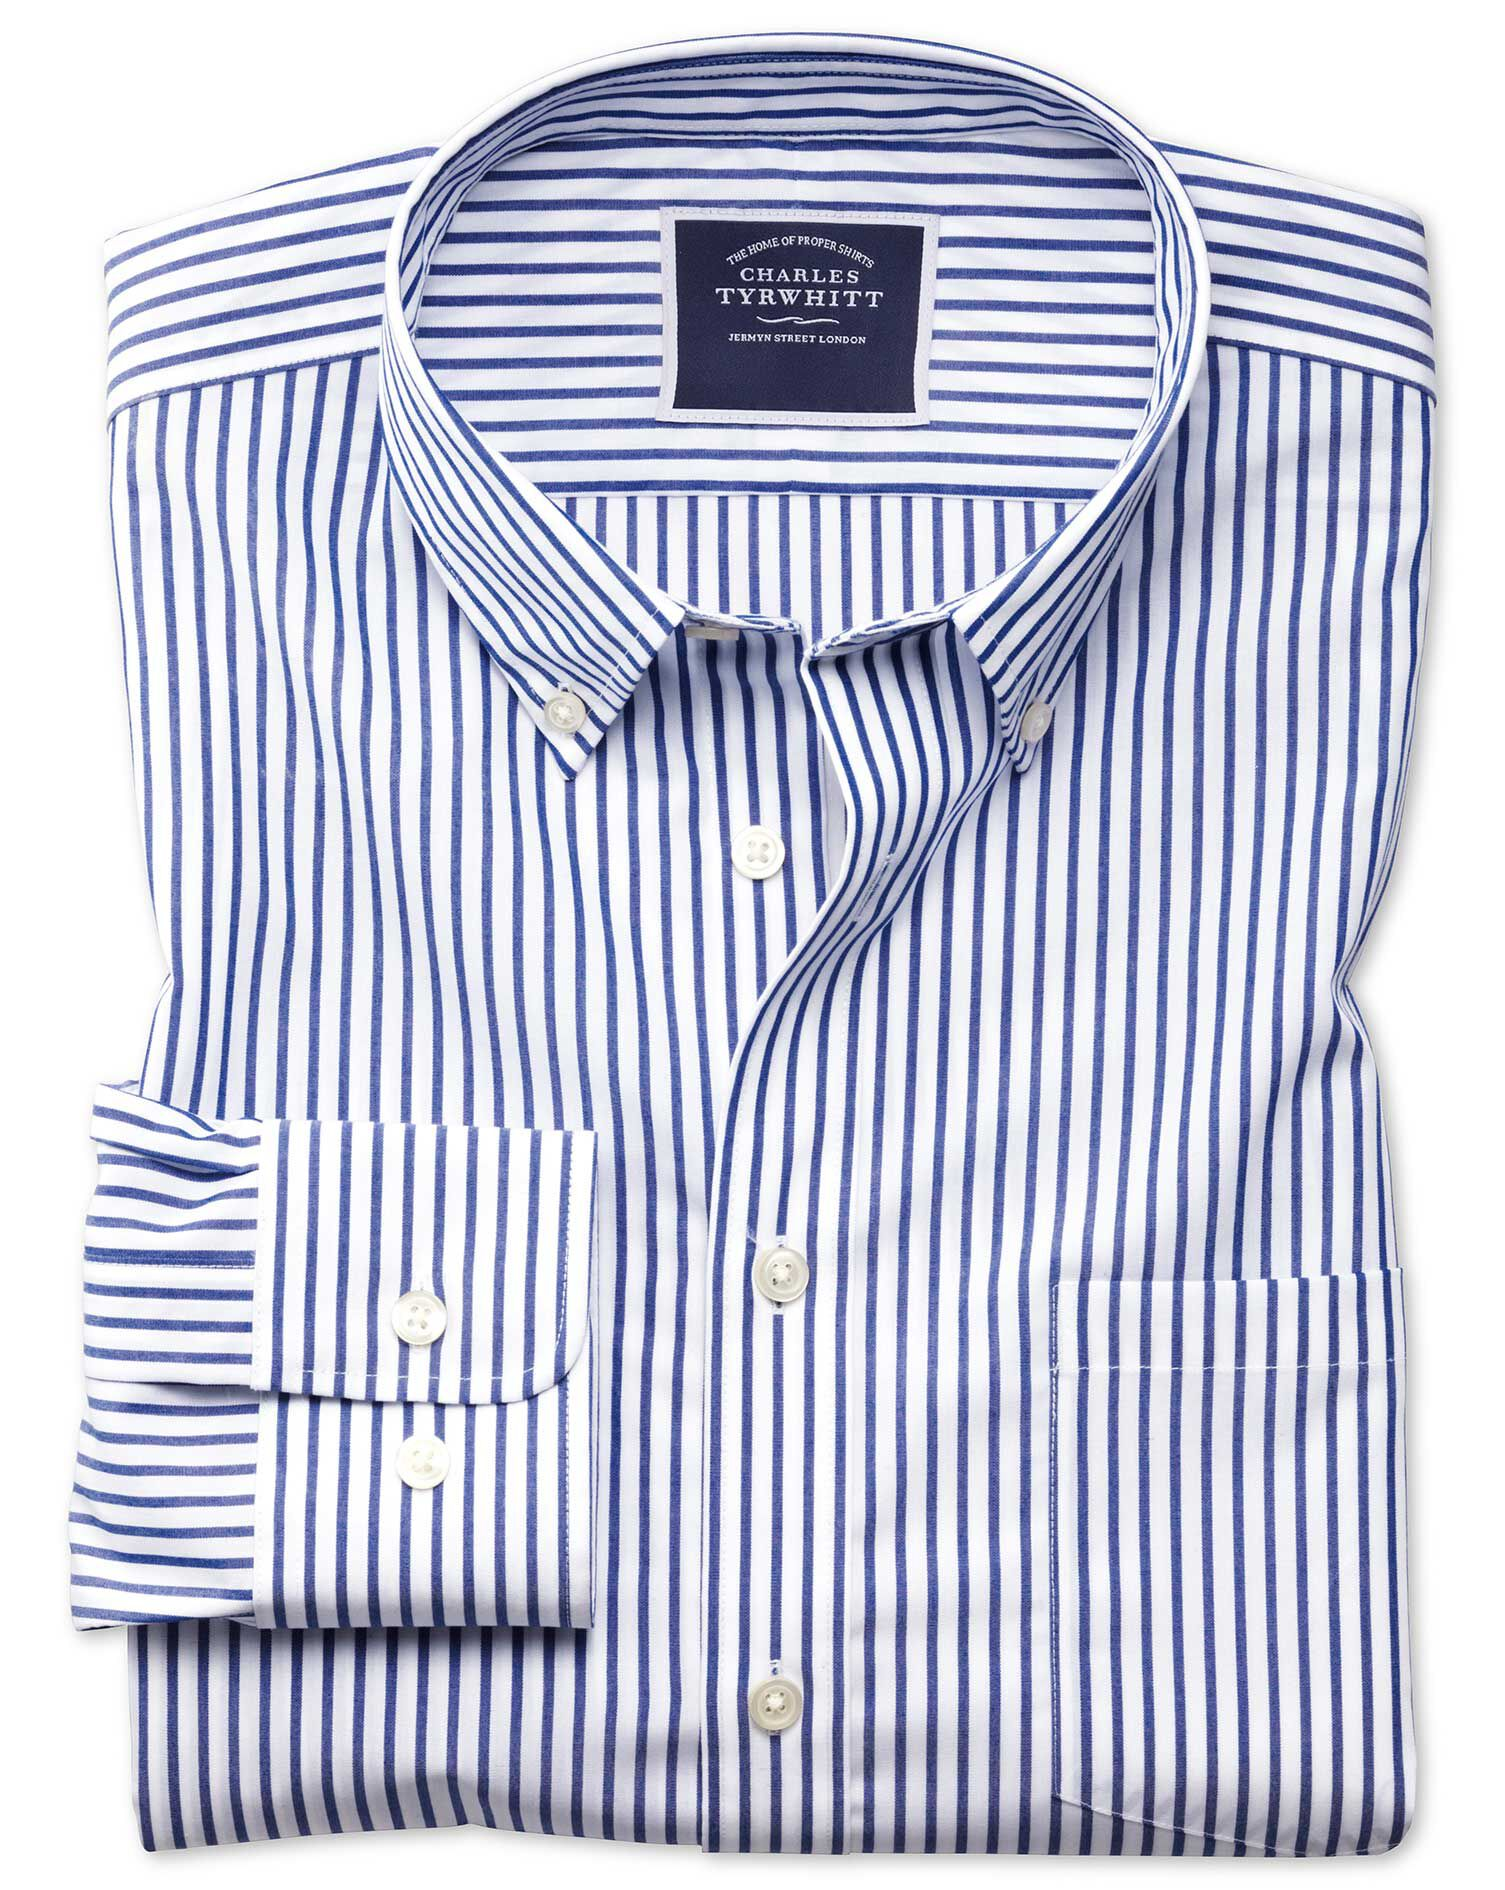 Slim Fit Button-Down Non-Iron Poplin Blue Stripe Cotton Shirt Single Cuff Size XS by Charles Tyrwhit